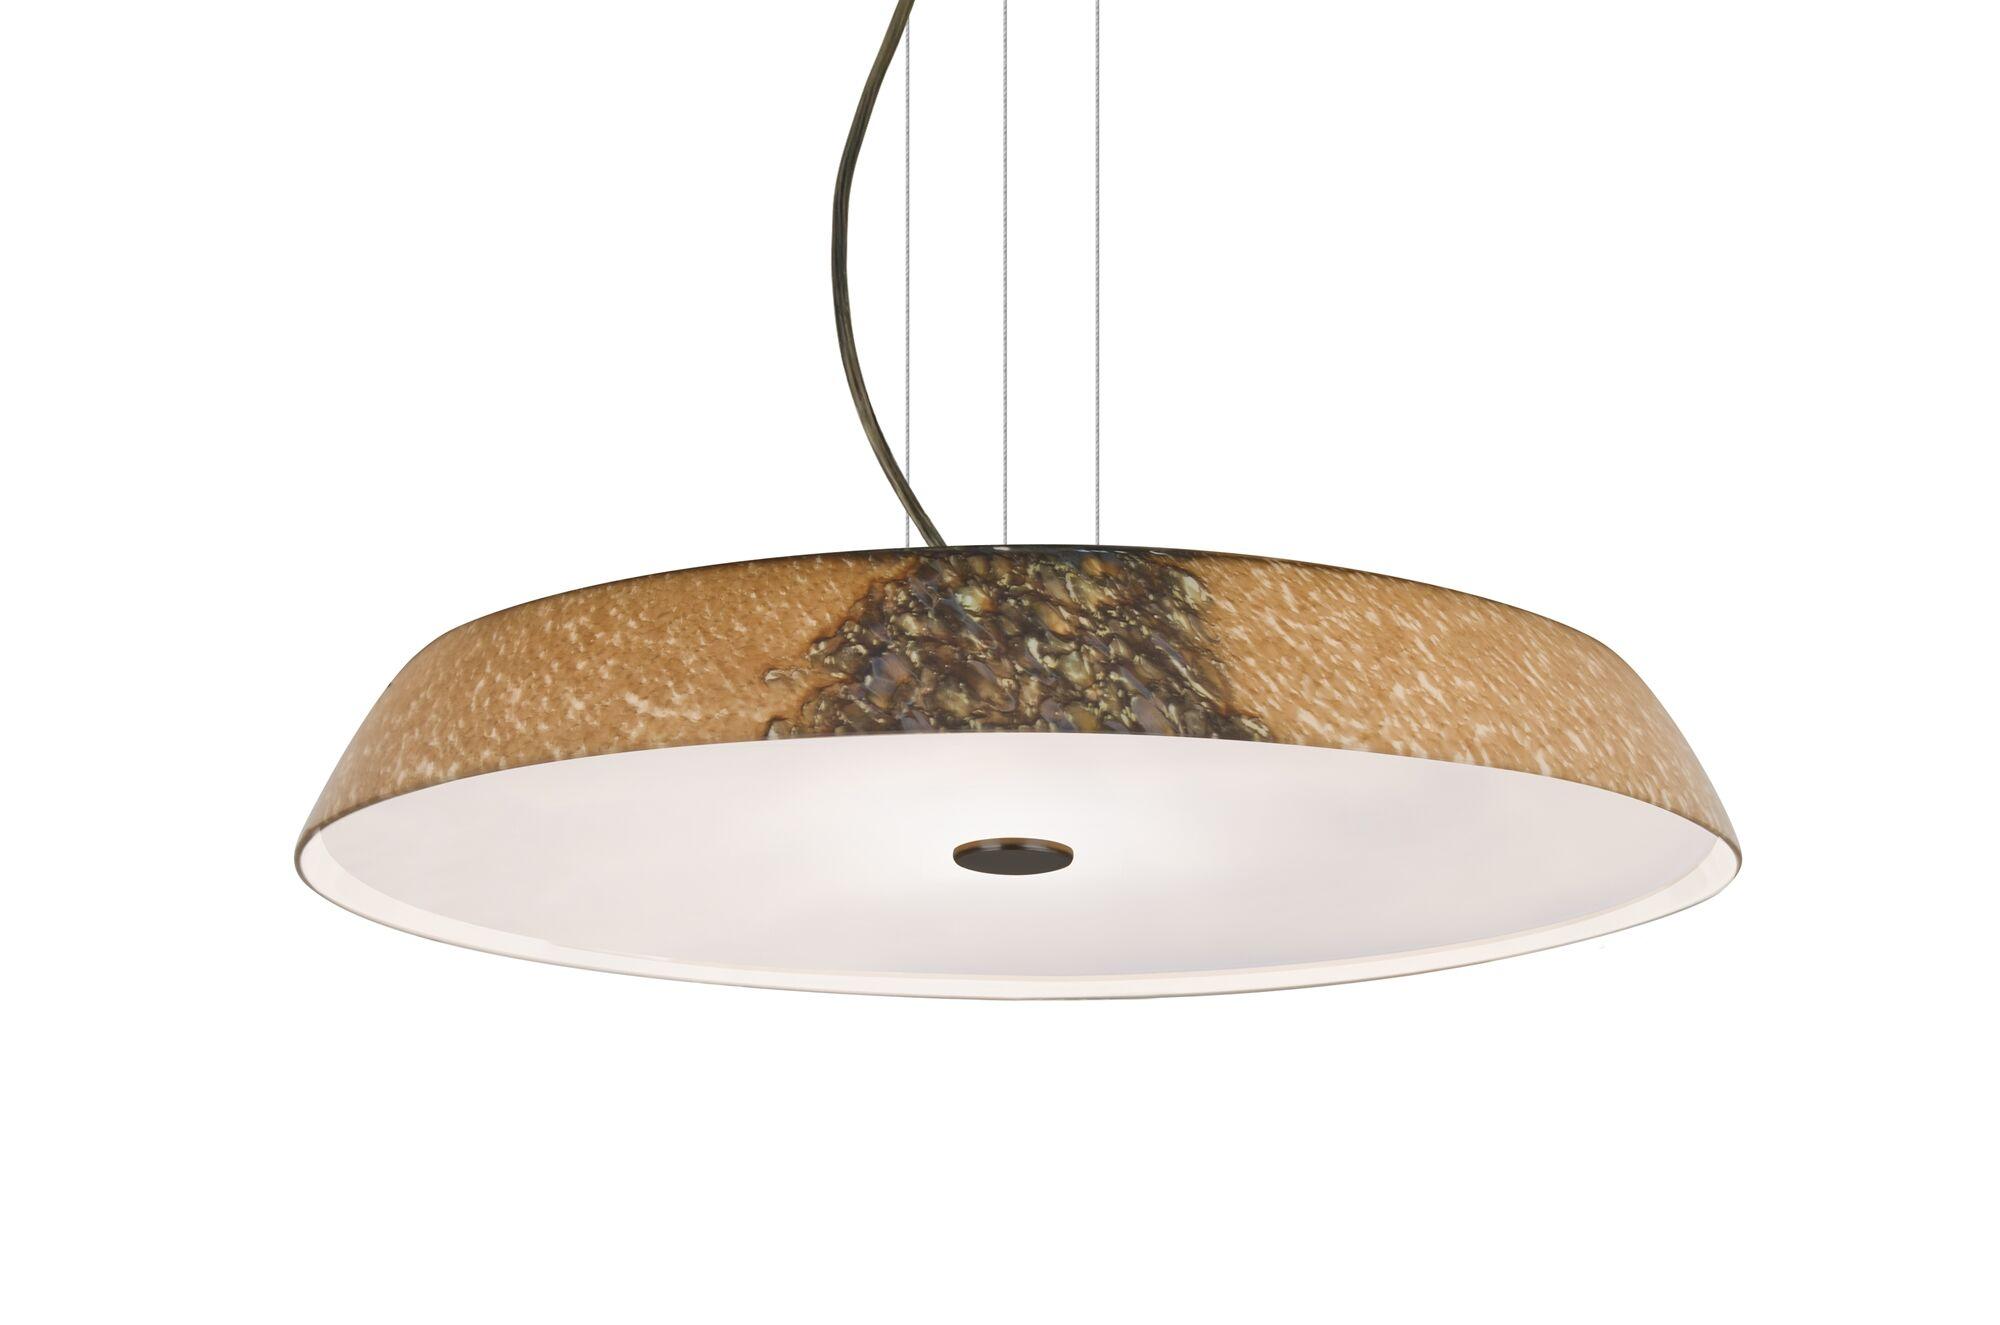 Speier Round Suspension 1-Light  LED  Pendant Finish: Bronze